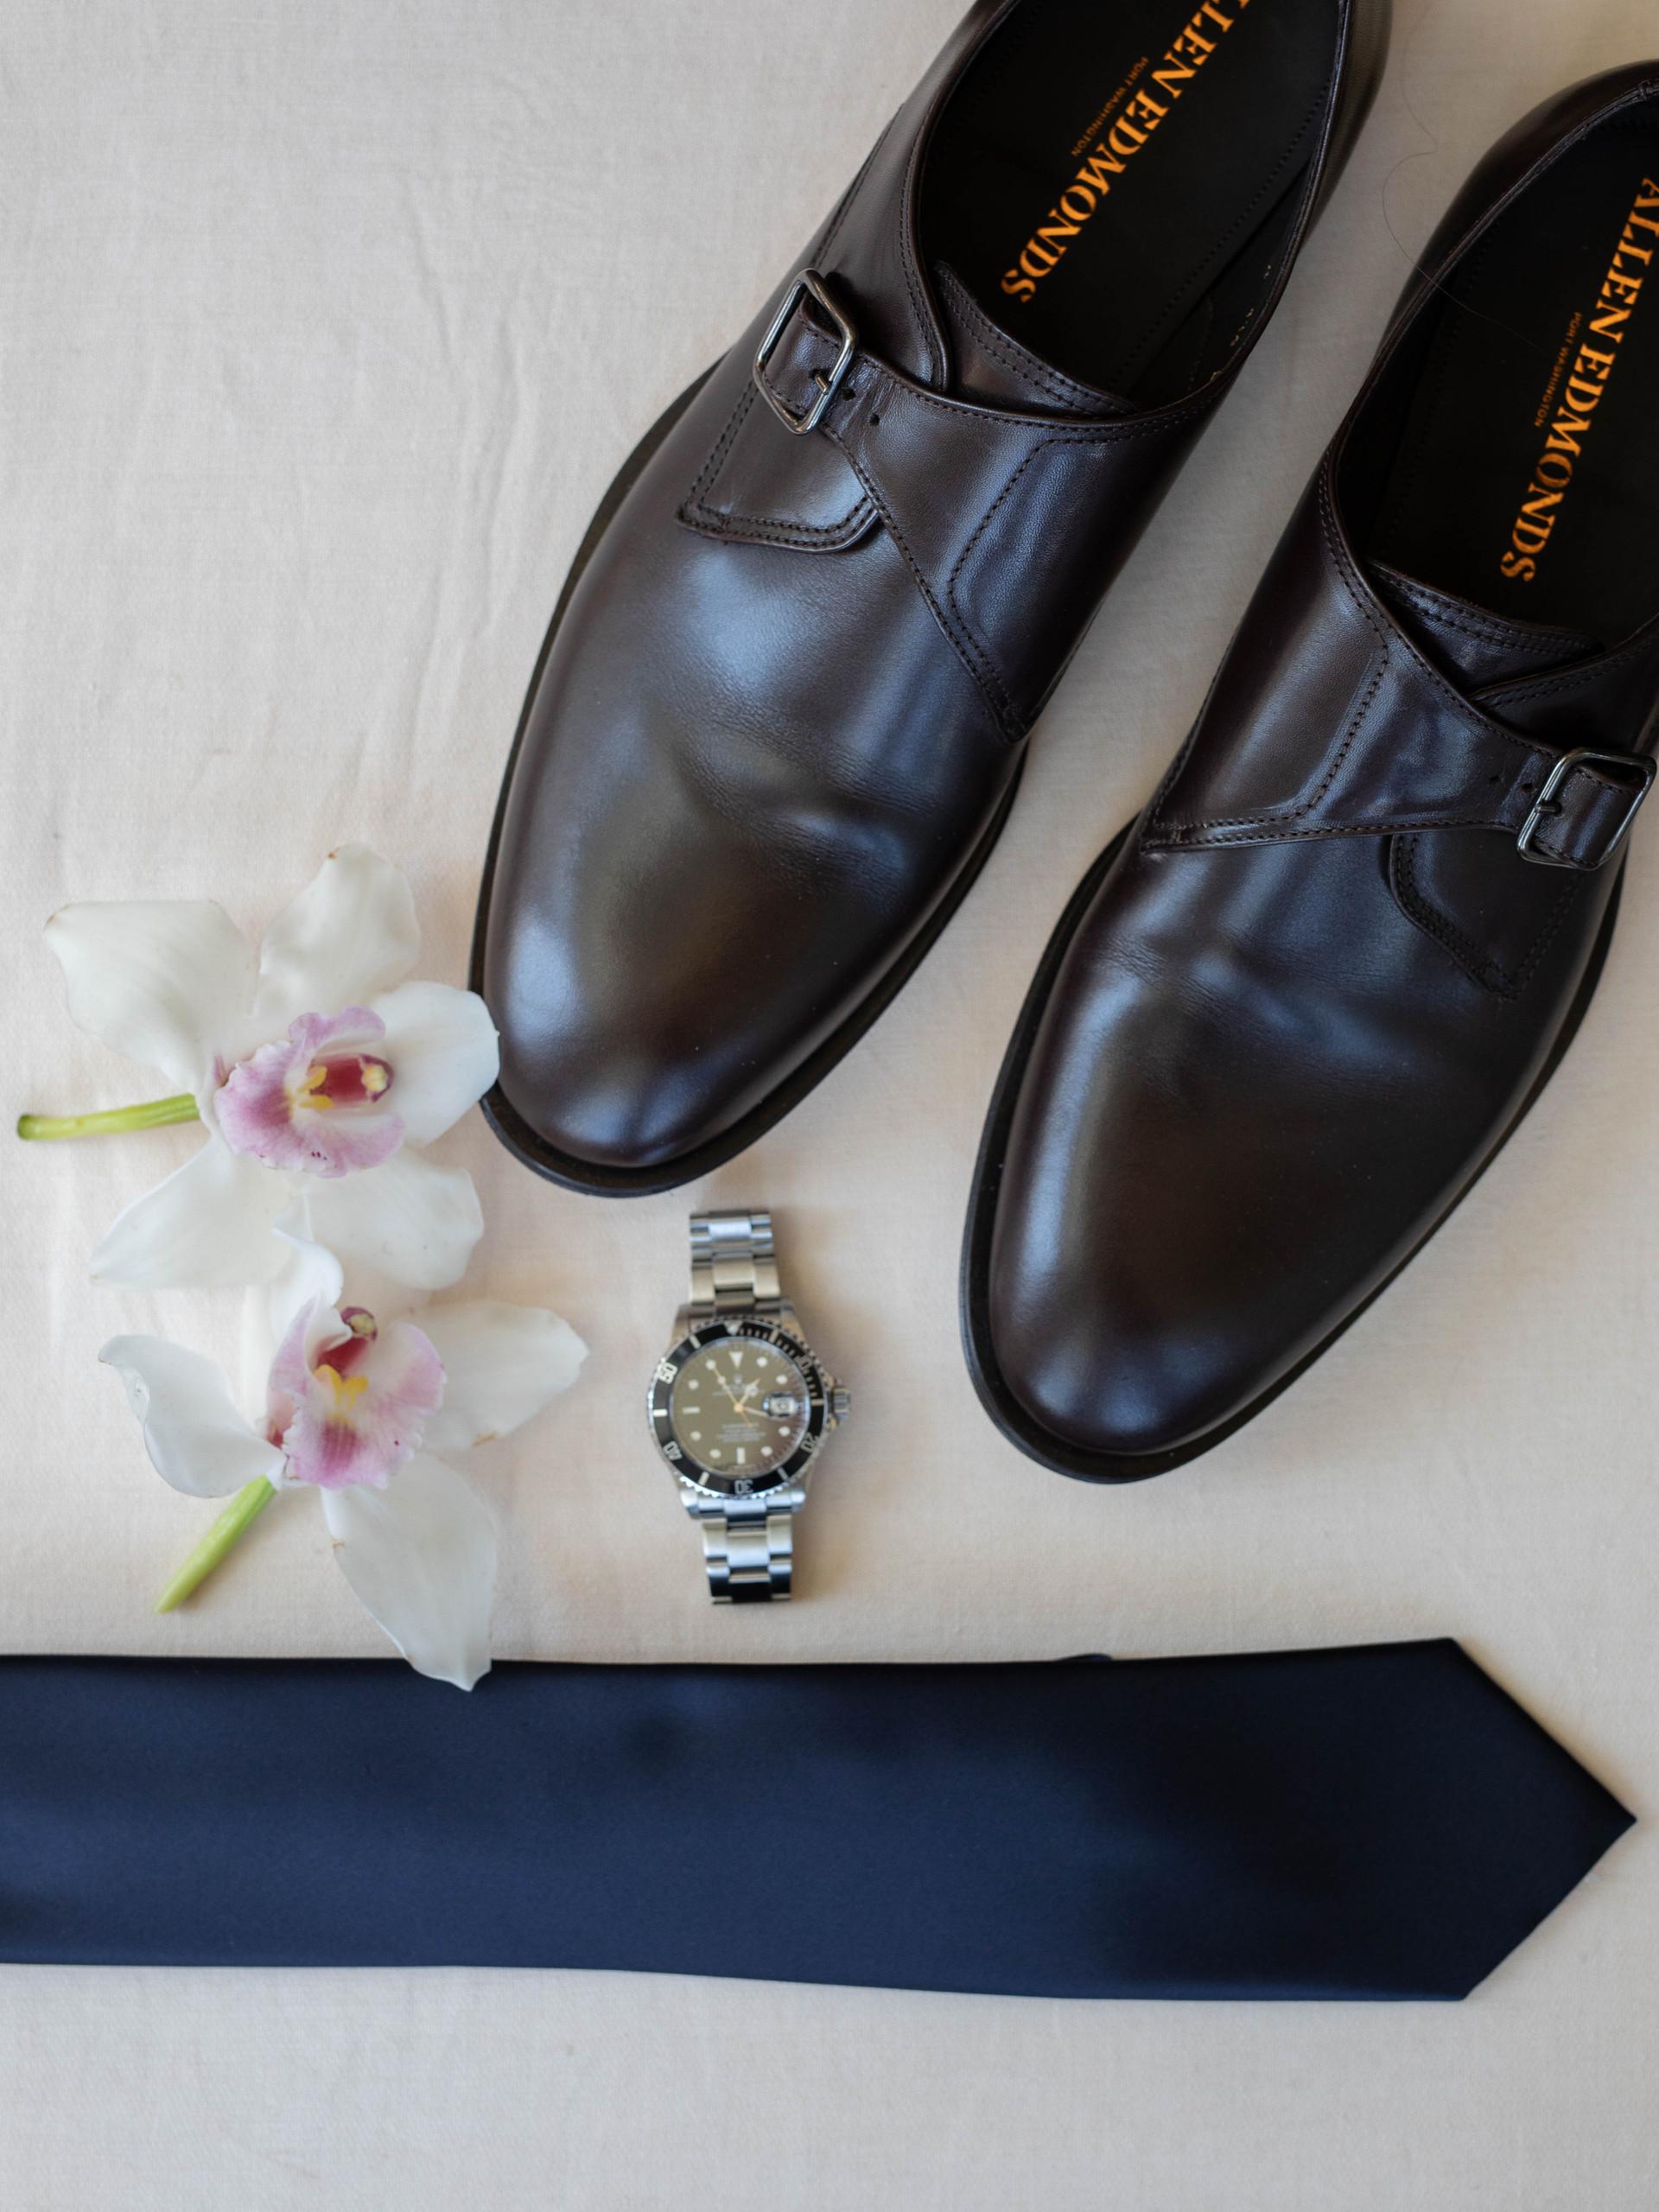 new-jersey-wedding-groom-suit-shoes-sock